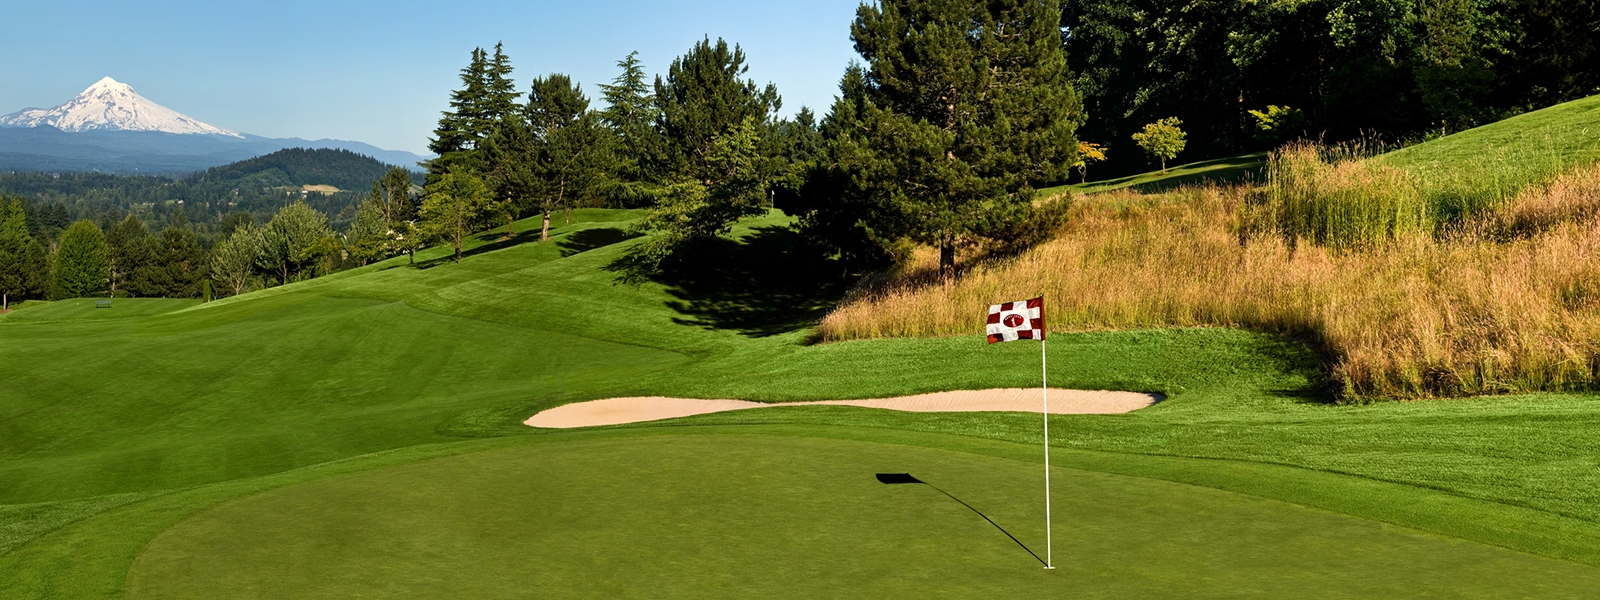 Public Golf Courses In Oklahoma City Area